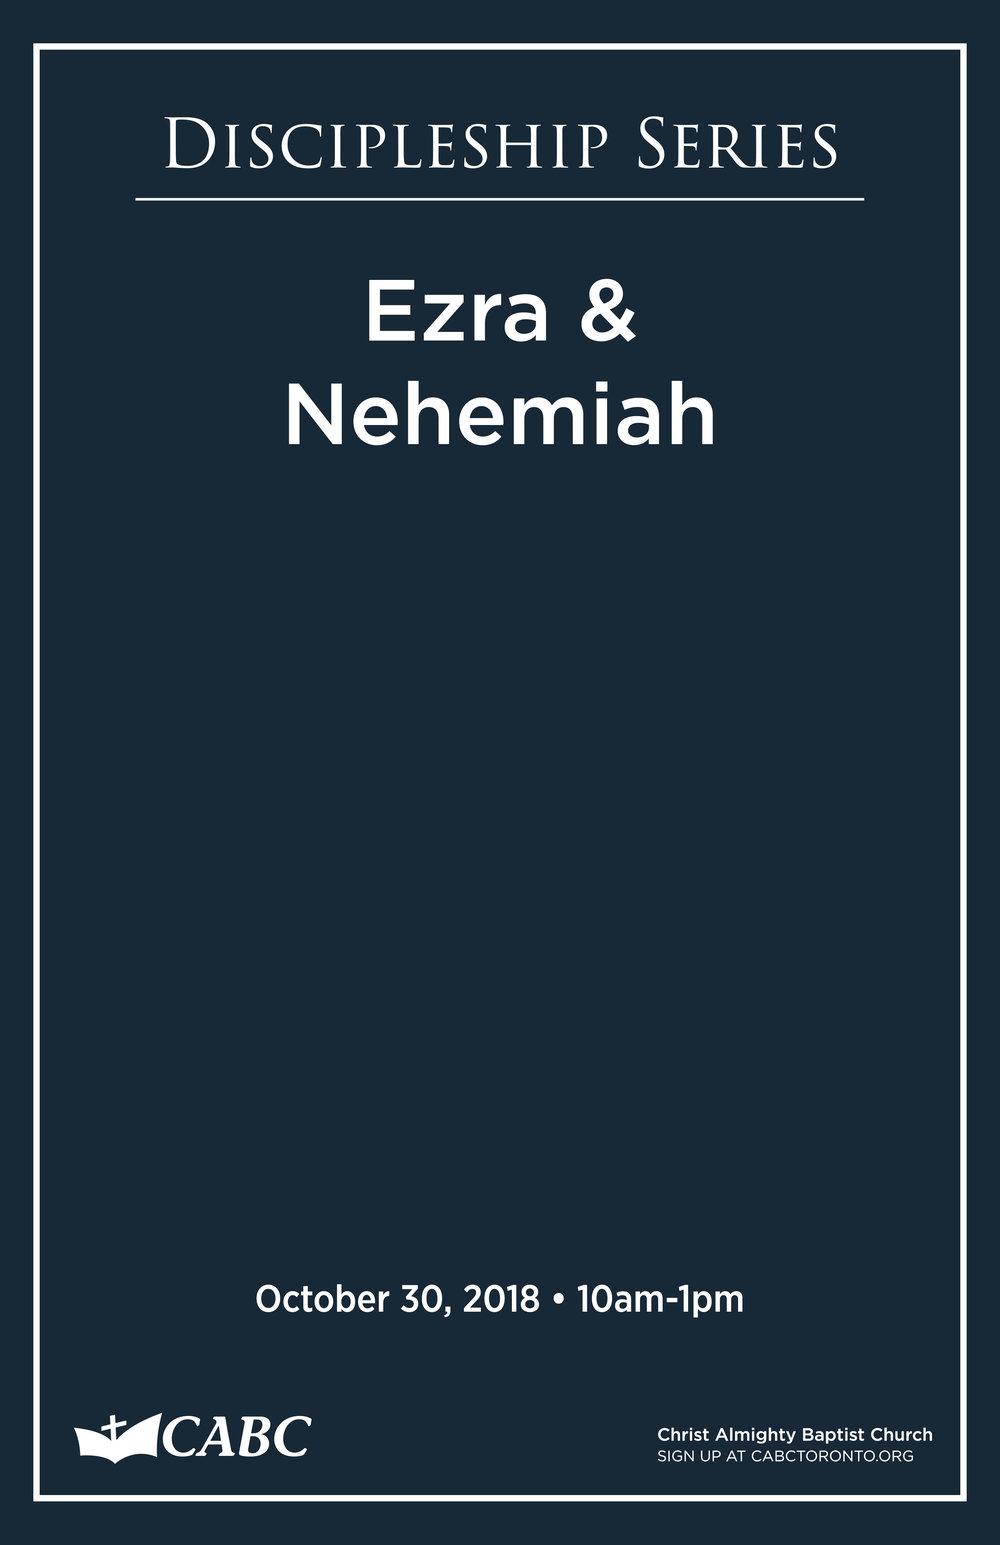 CABC-DiscipleshipSeries2018-Ezra-Nehemiah-Poster.jpg